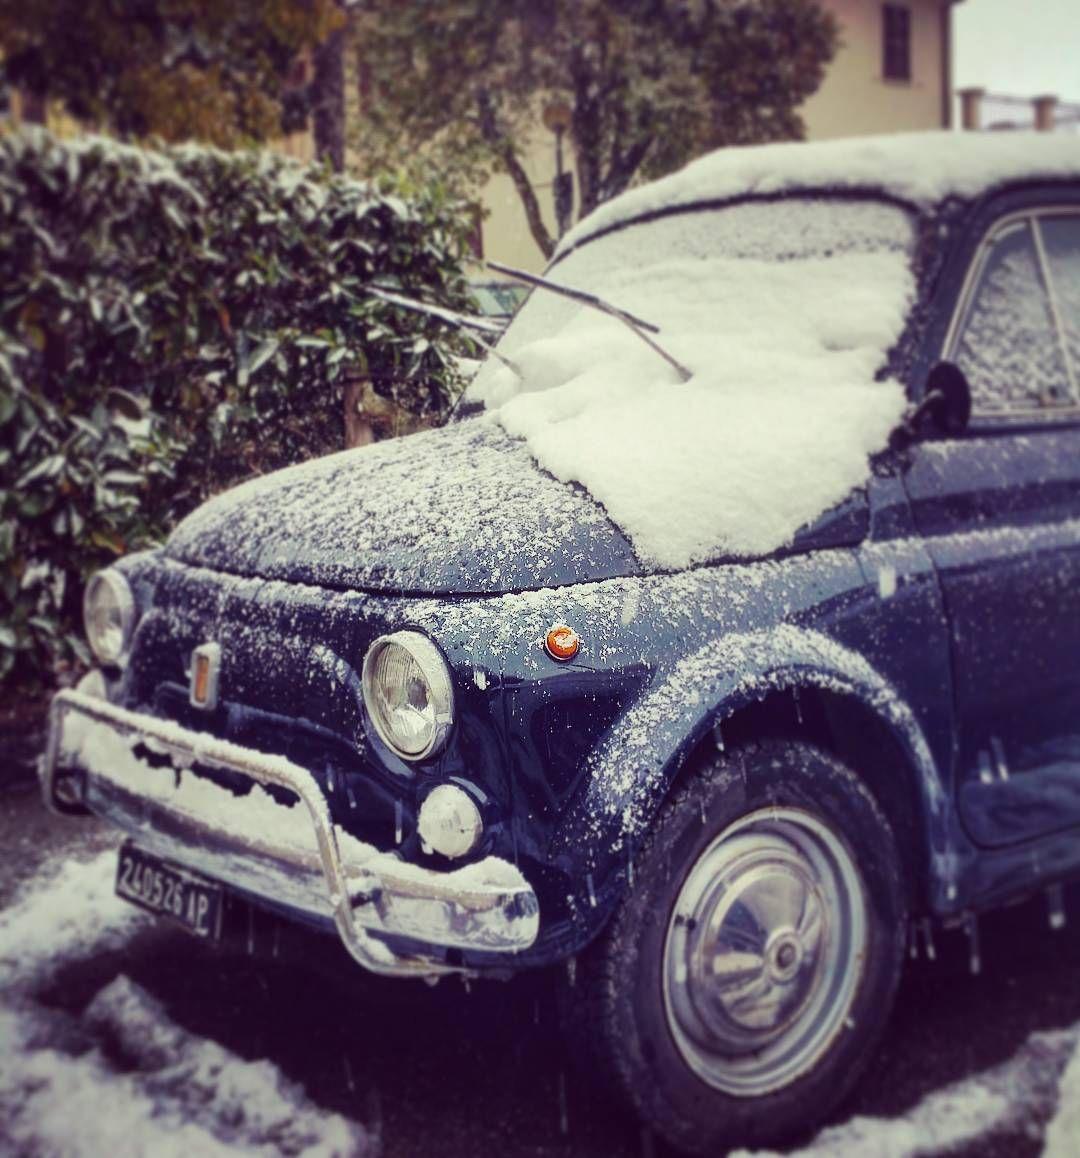 Let it snow.....on a 500 ❄⛄ #letitsnow #montelparo #500 #fiat500  #cinquino #cinquecento #fiatcinquecento #igers500 #baccala #santantonio #igersfermo @fiat500cinquecento